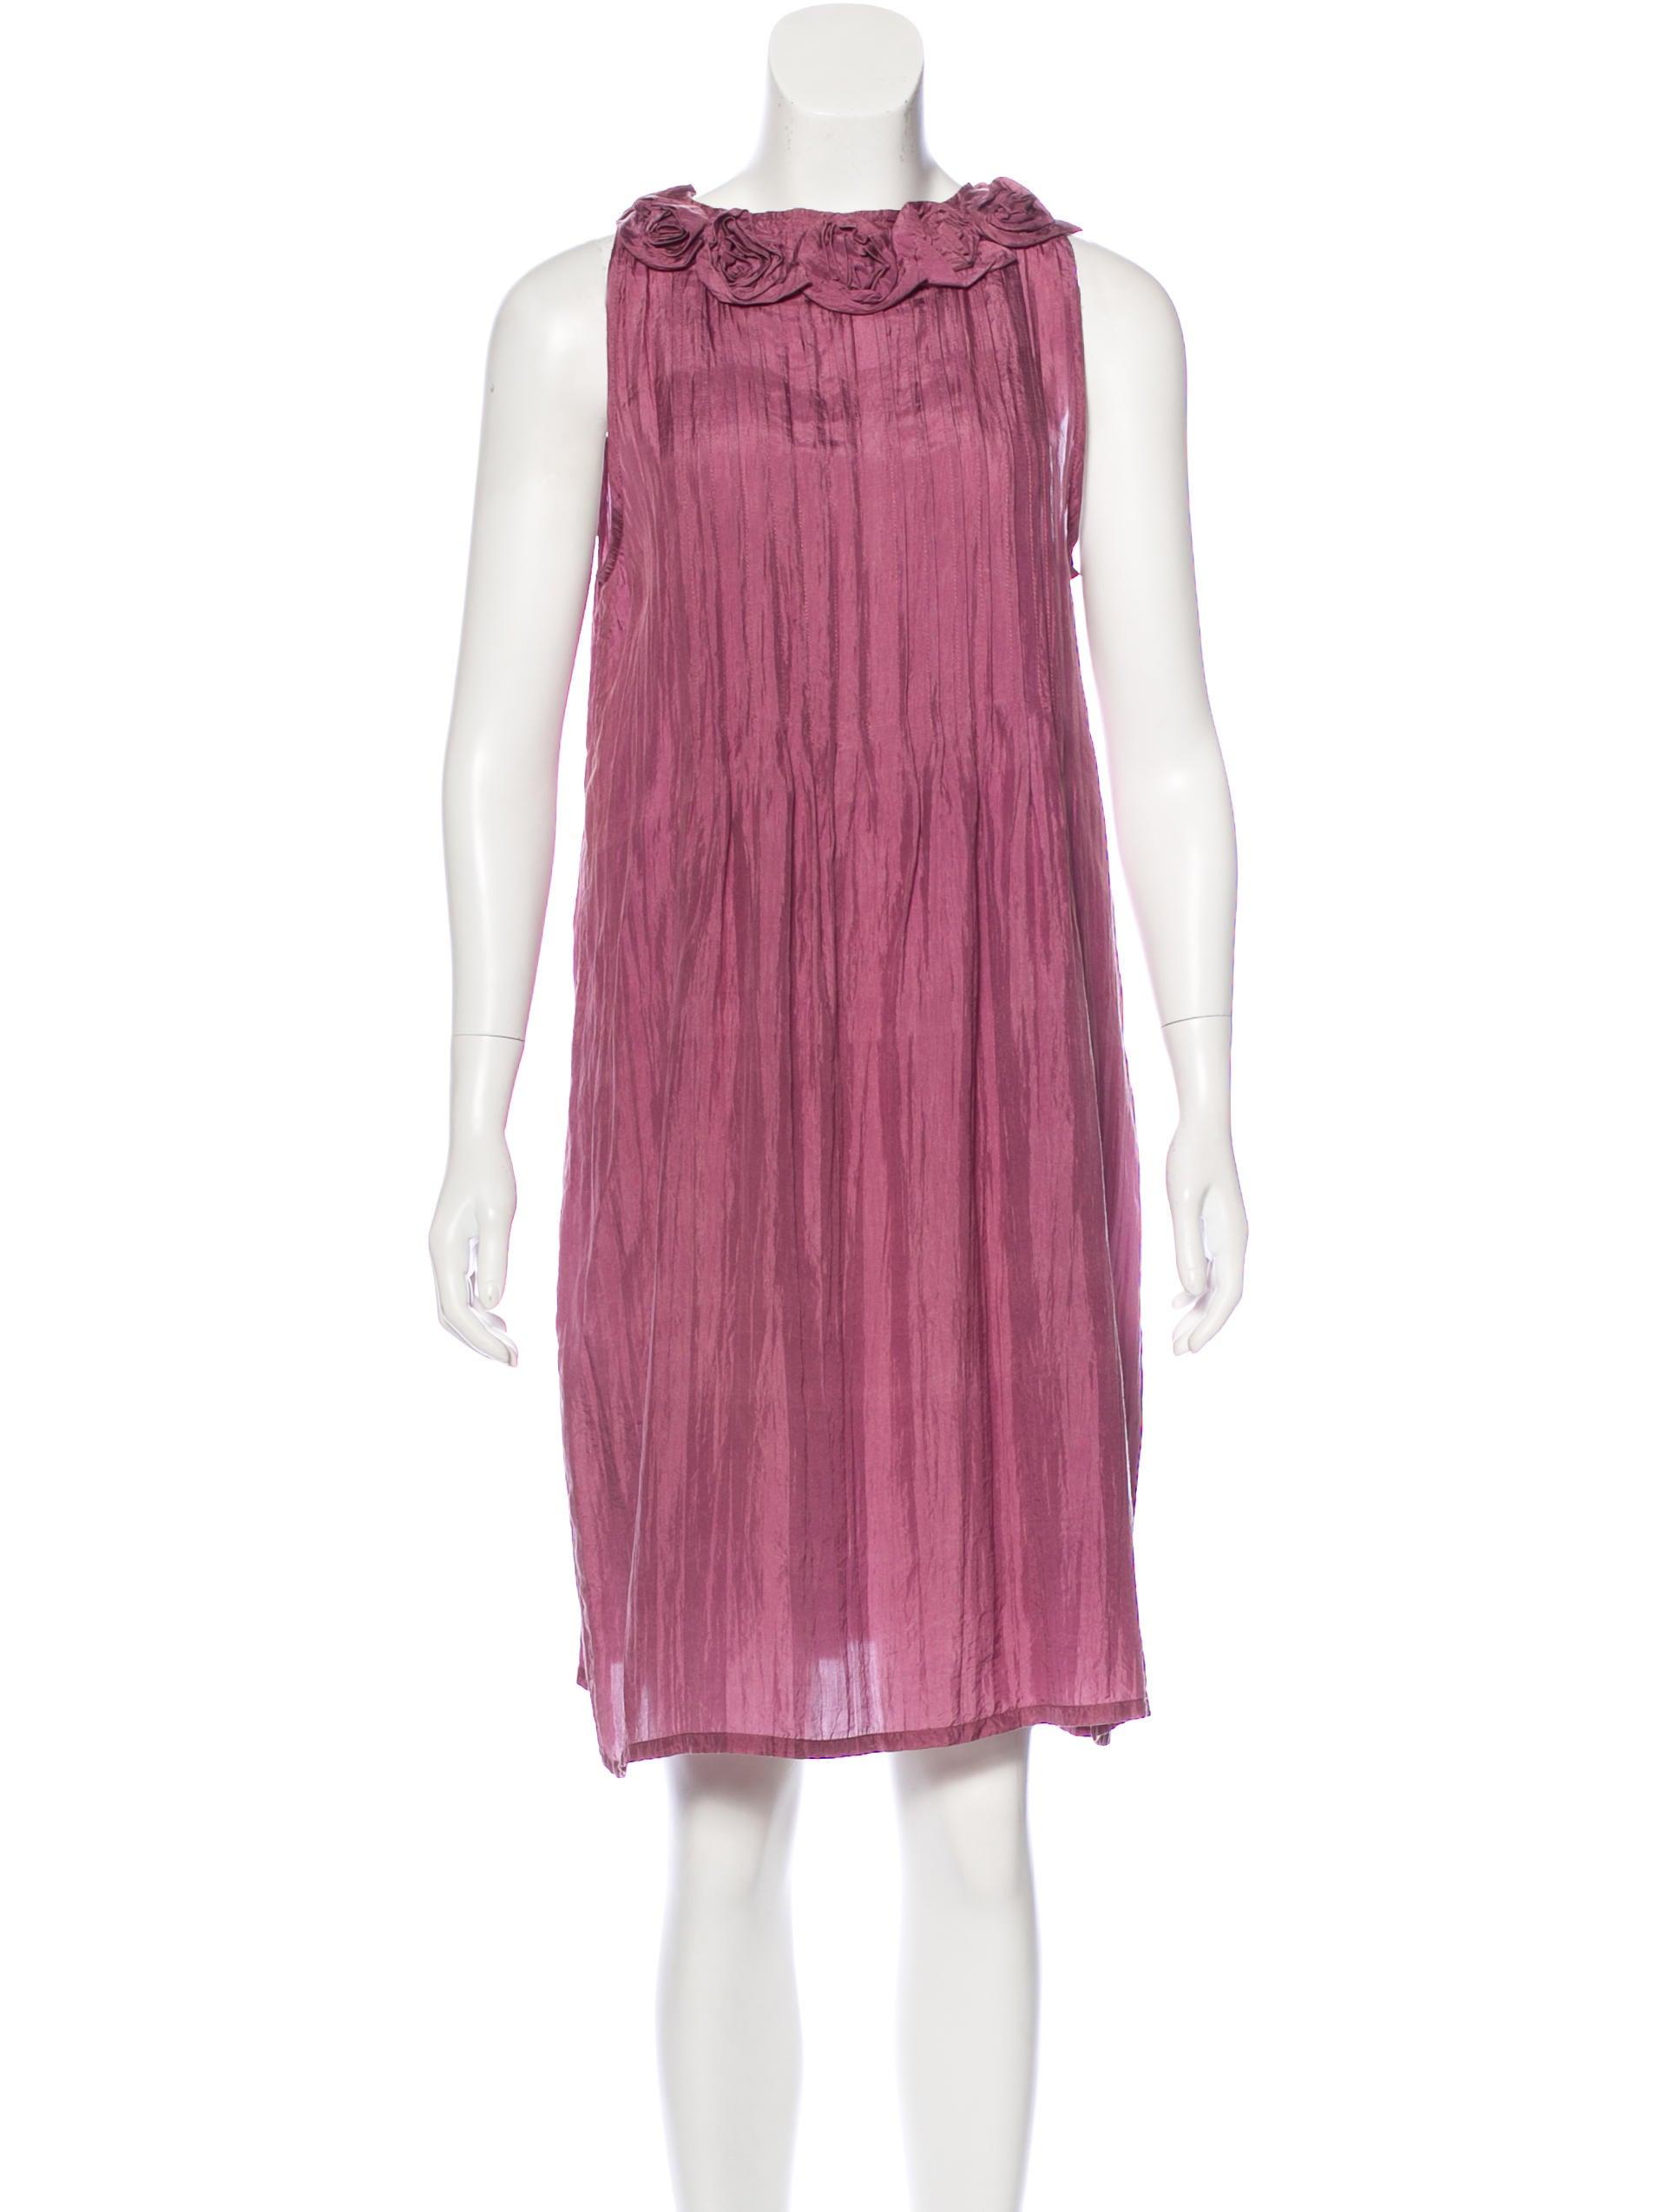 6fbb93347b05 Chan Luu Silk Shift Dress - Clothing - WCF21315 | The RealReal